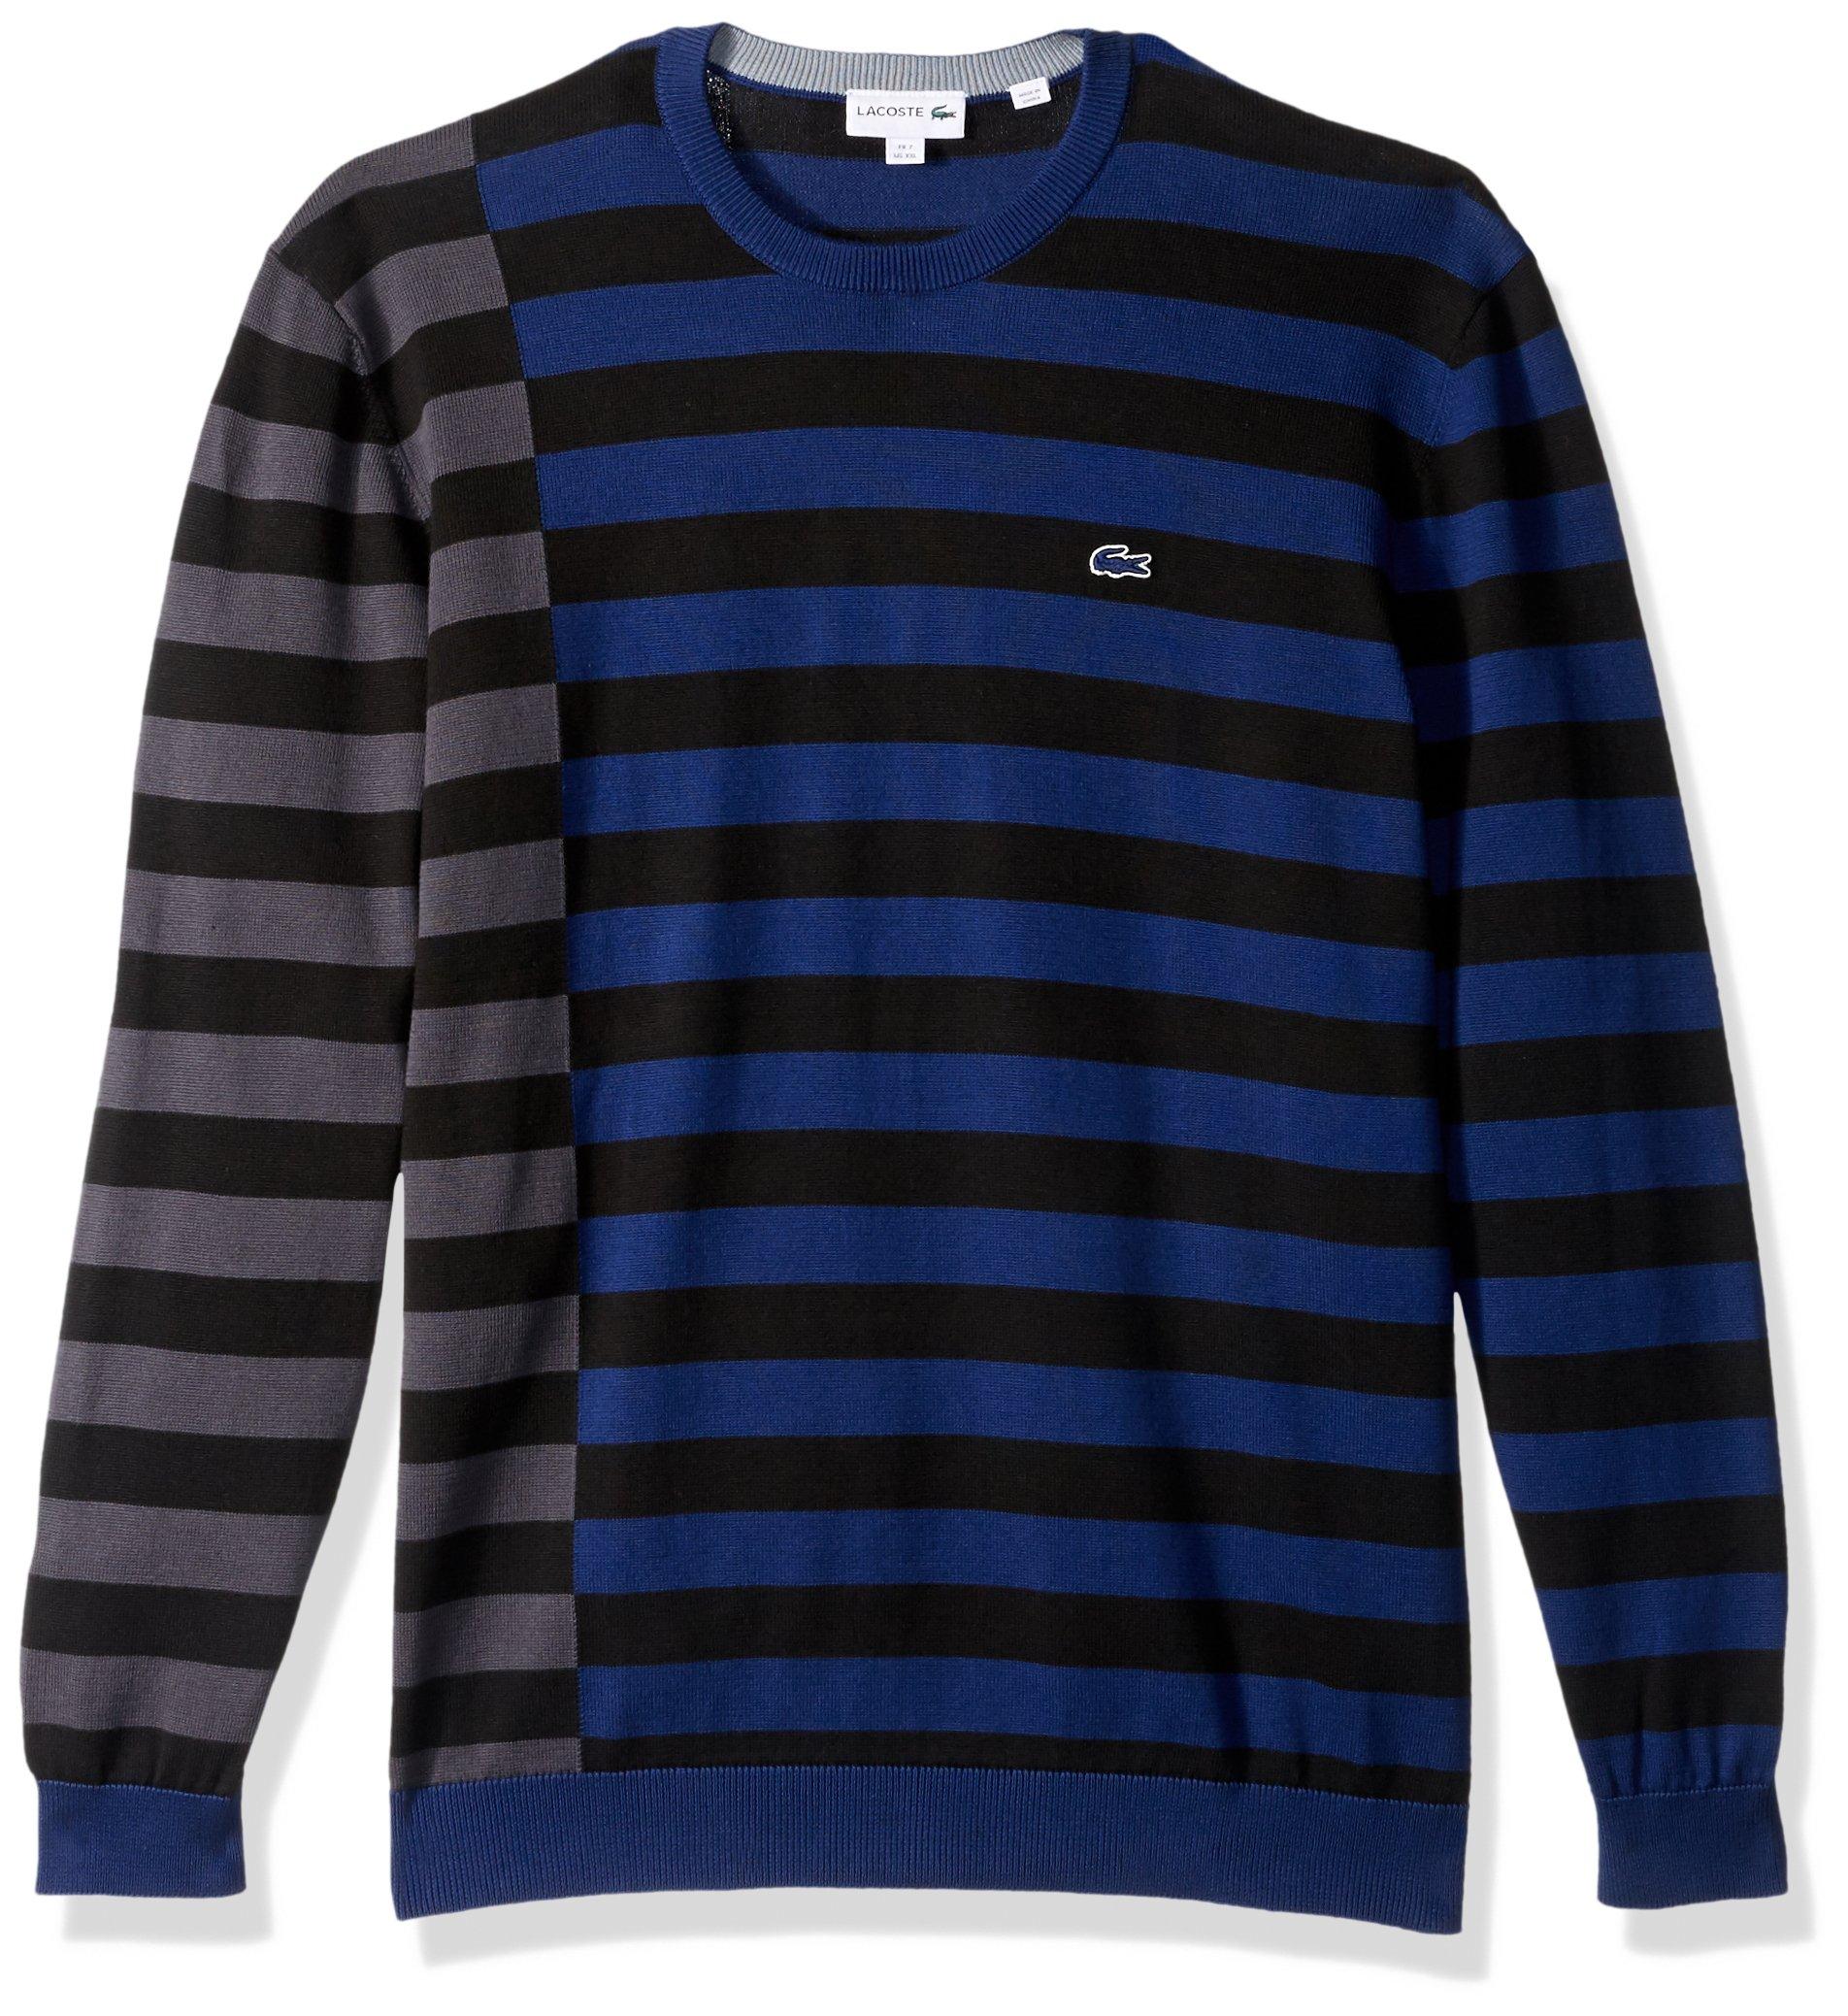 Lacoste Men's Broken Striped Cotton Sweater, Methylene/Black/Graphite/Mill Blue, 5